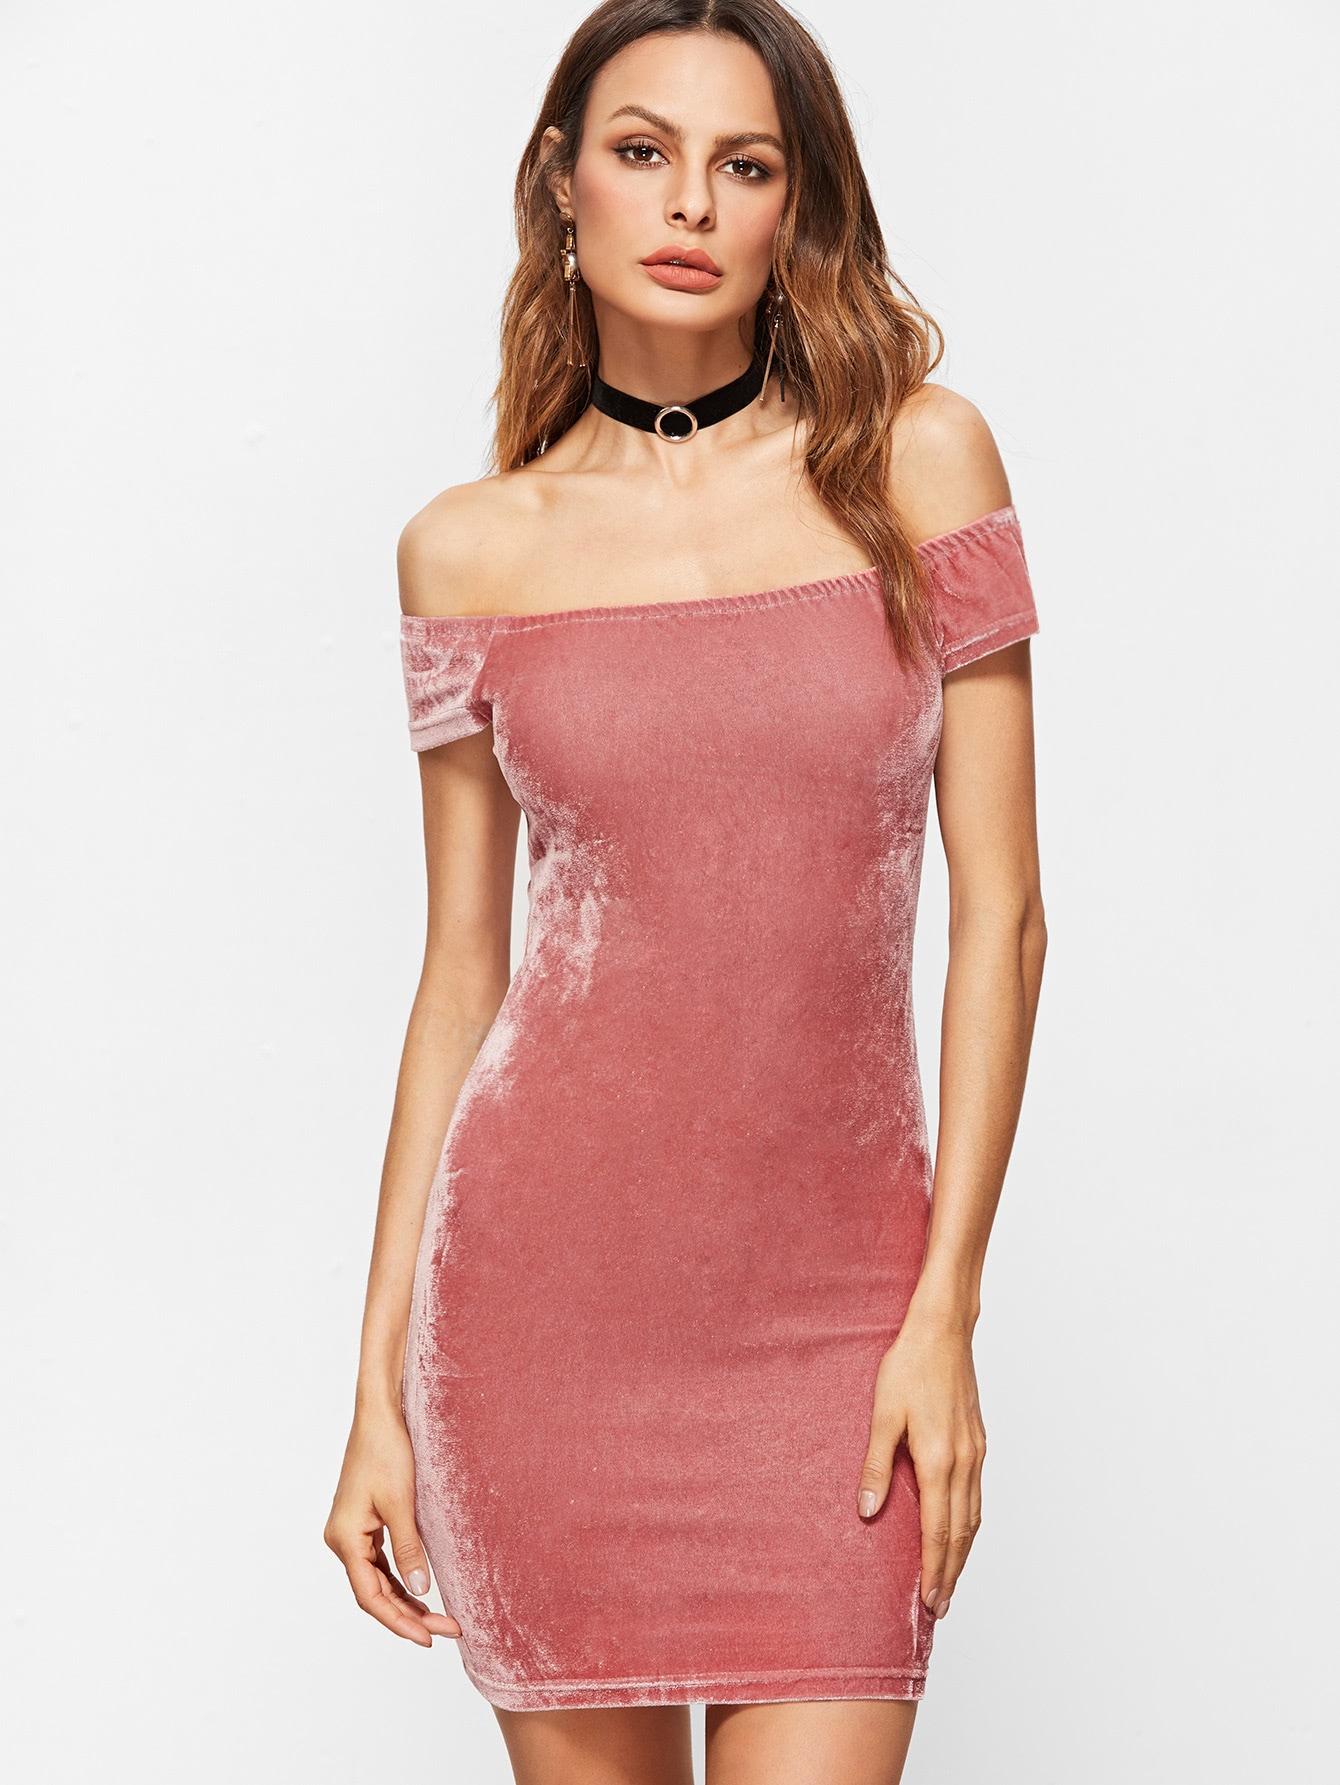 Bardot Velvet Bodycon Dress Shein Sheinside